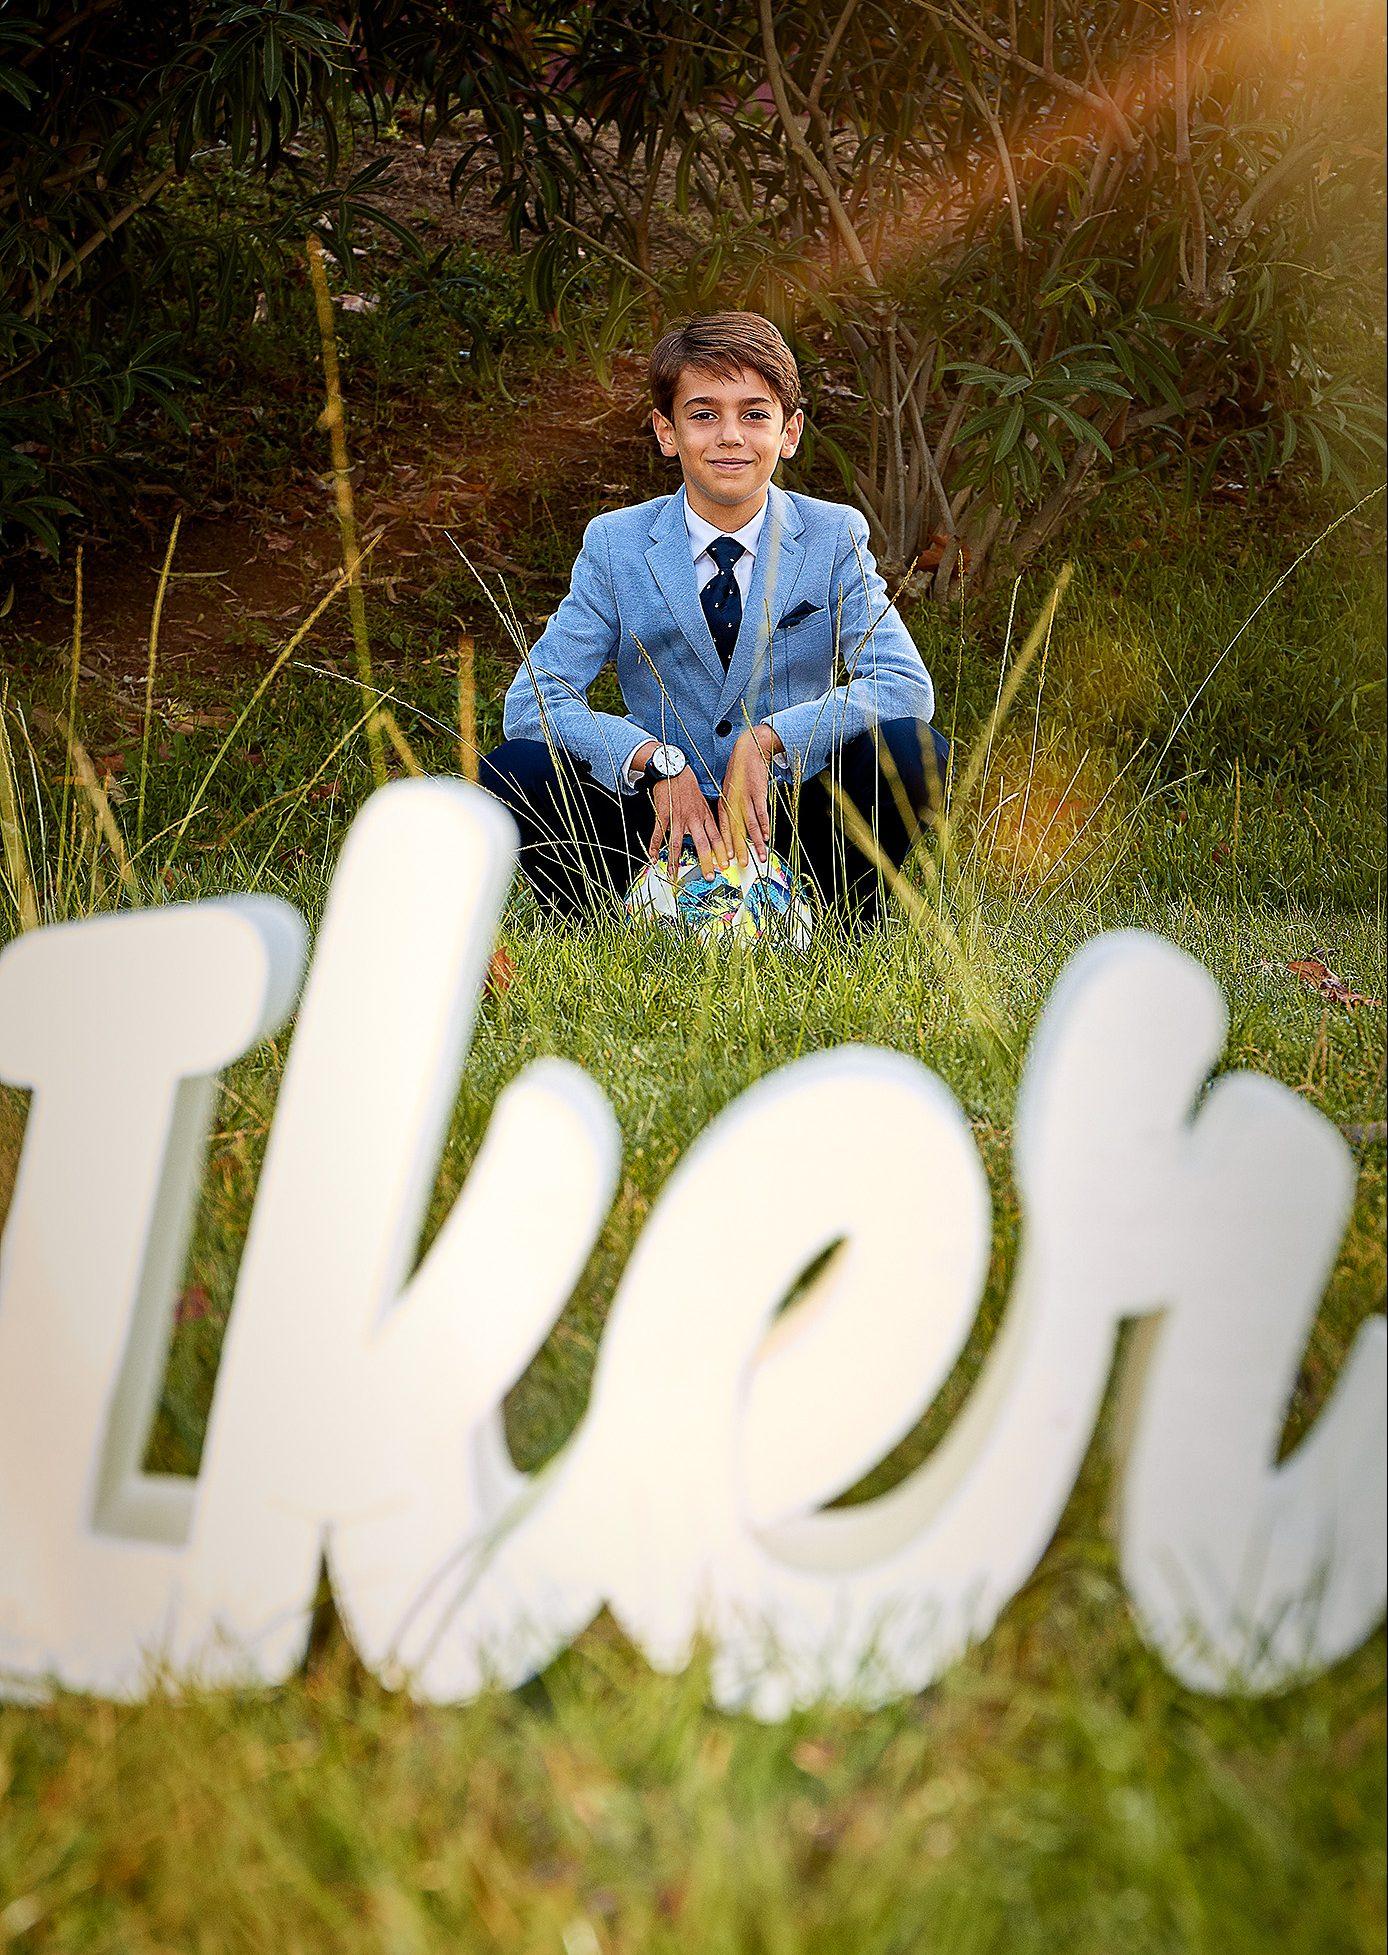 https://www.kidsphotography.es/wp-content/uploads/2020/09/Iker_6804-©-Ruben-Baron-Photography-LR-e1601504046123.jpg